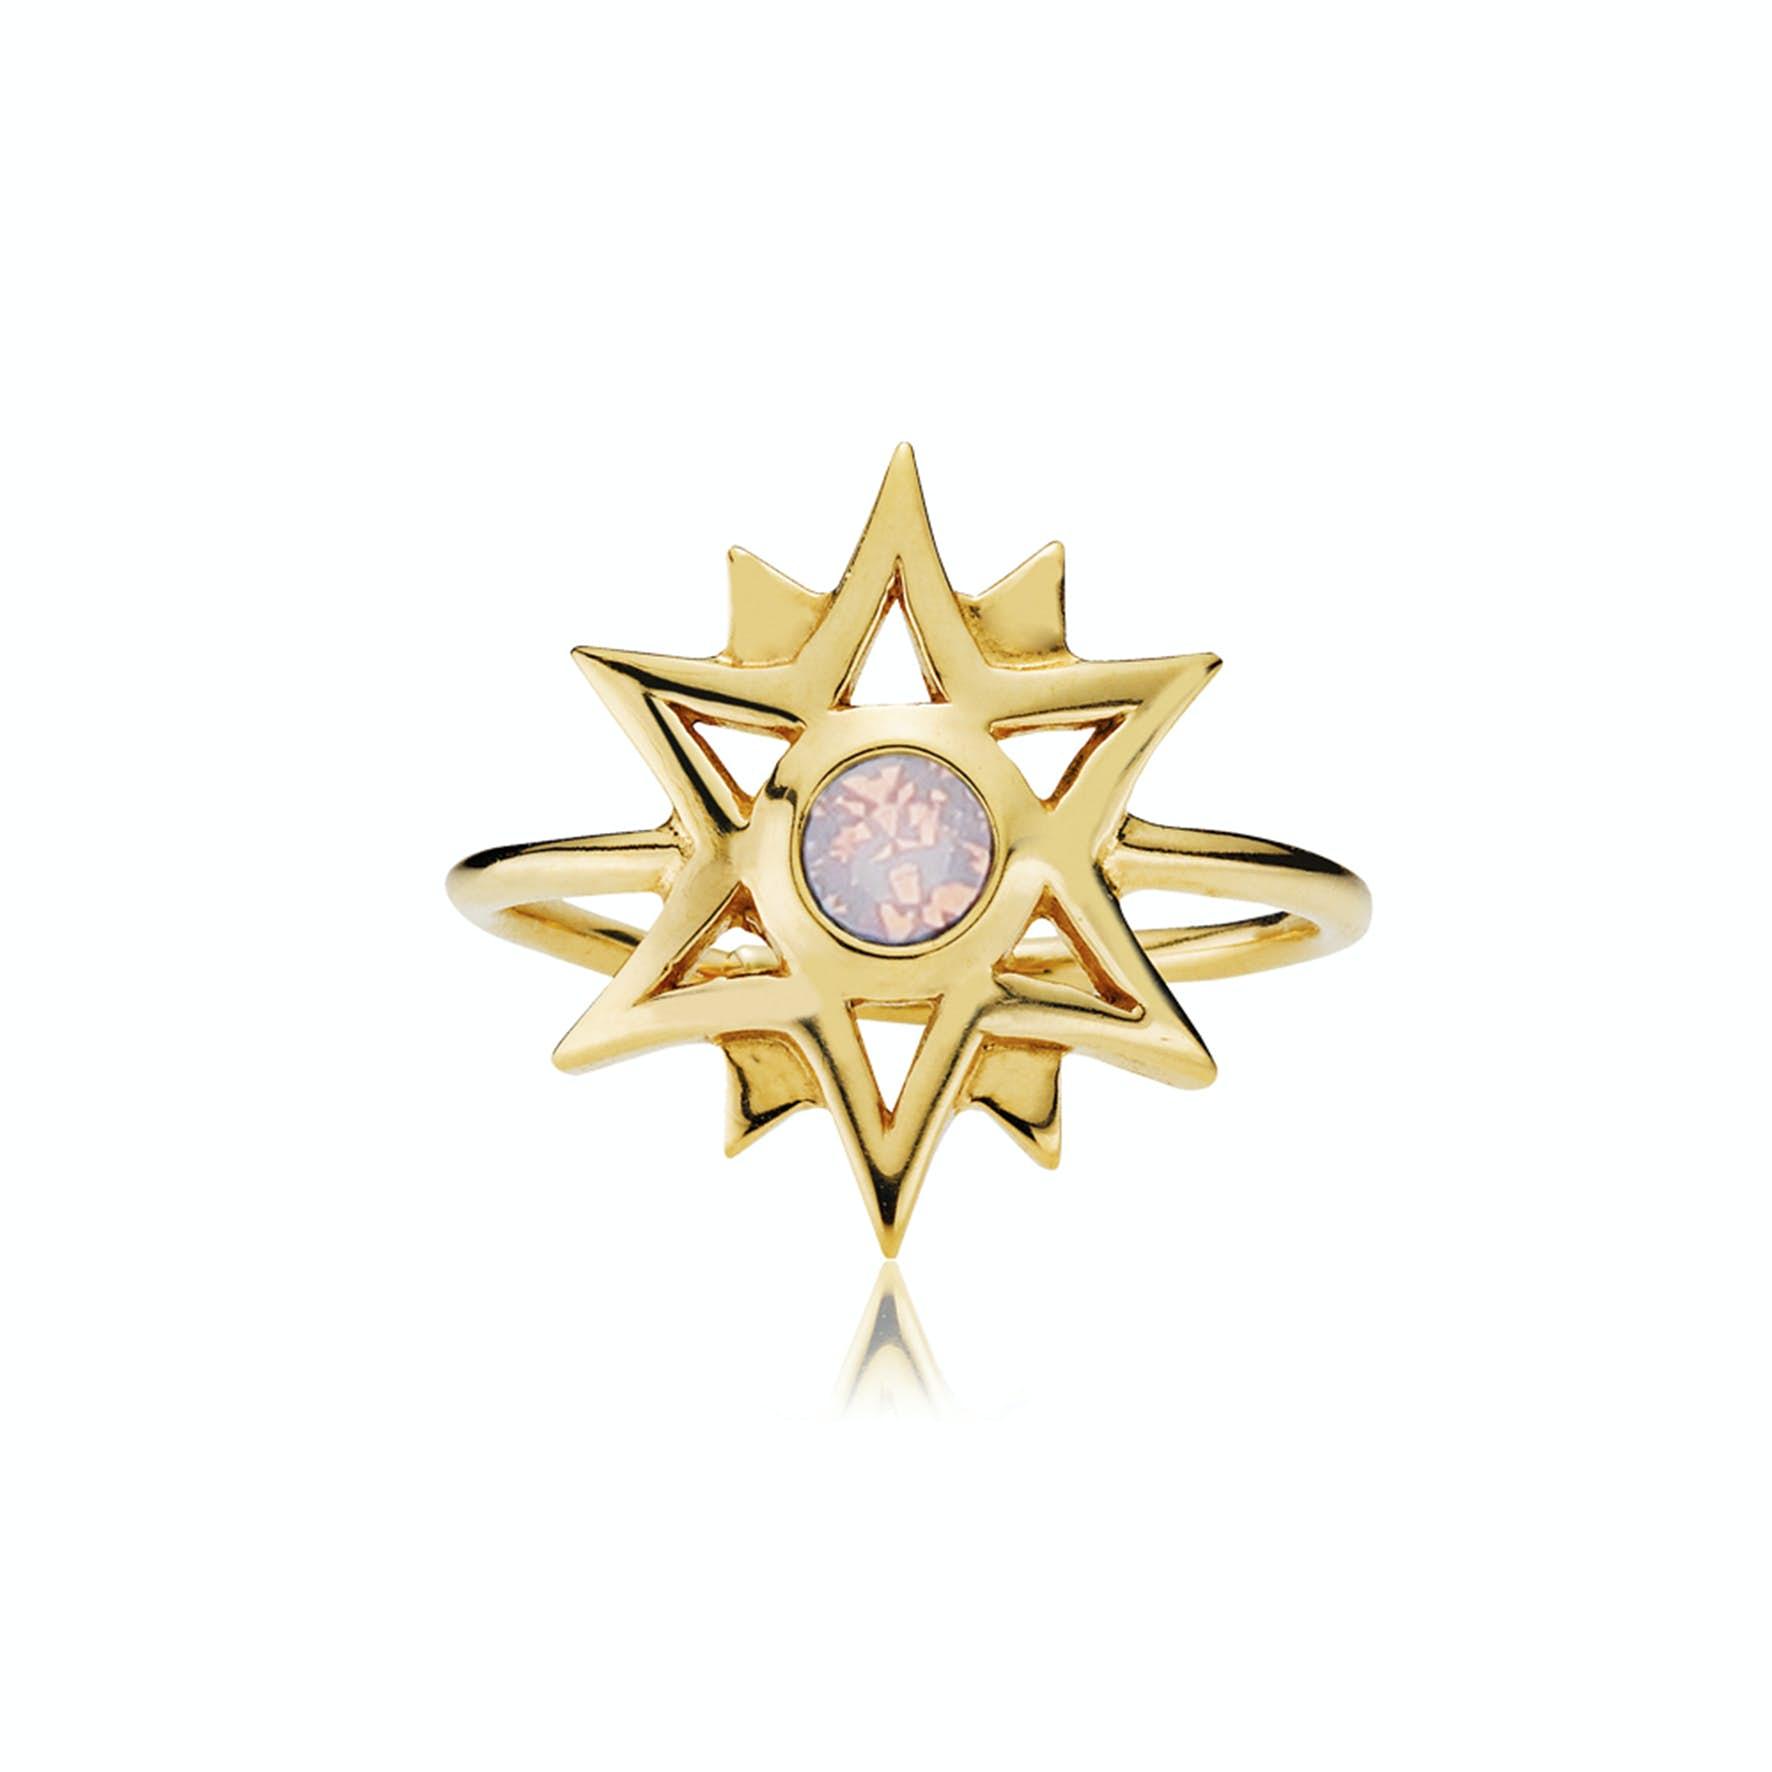 Olivia By Sistie Ring Rose Opal von Sistie in Vergoldet-Silber Sterling 925